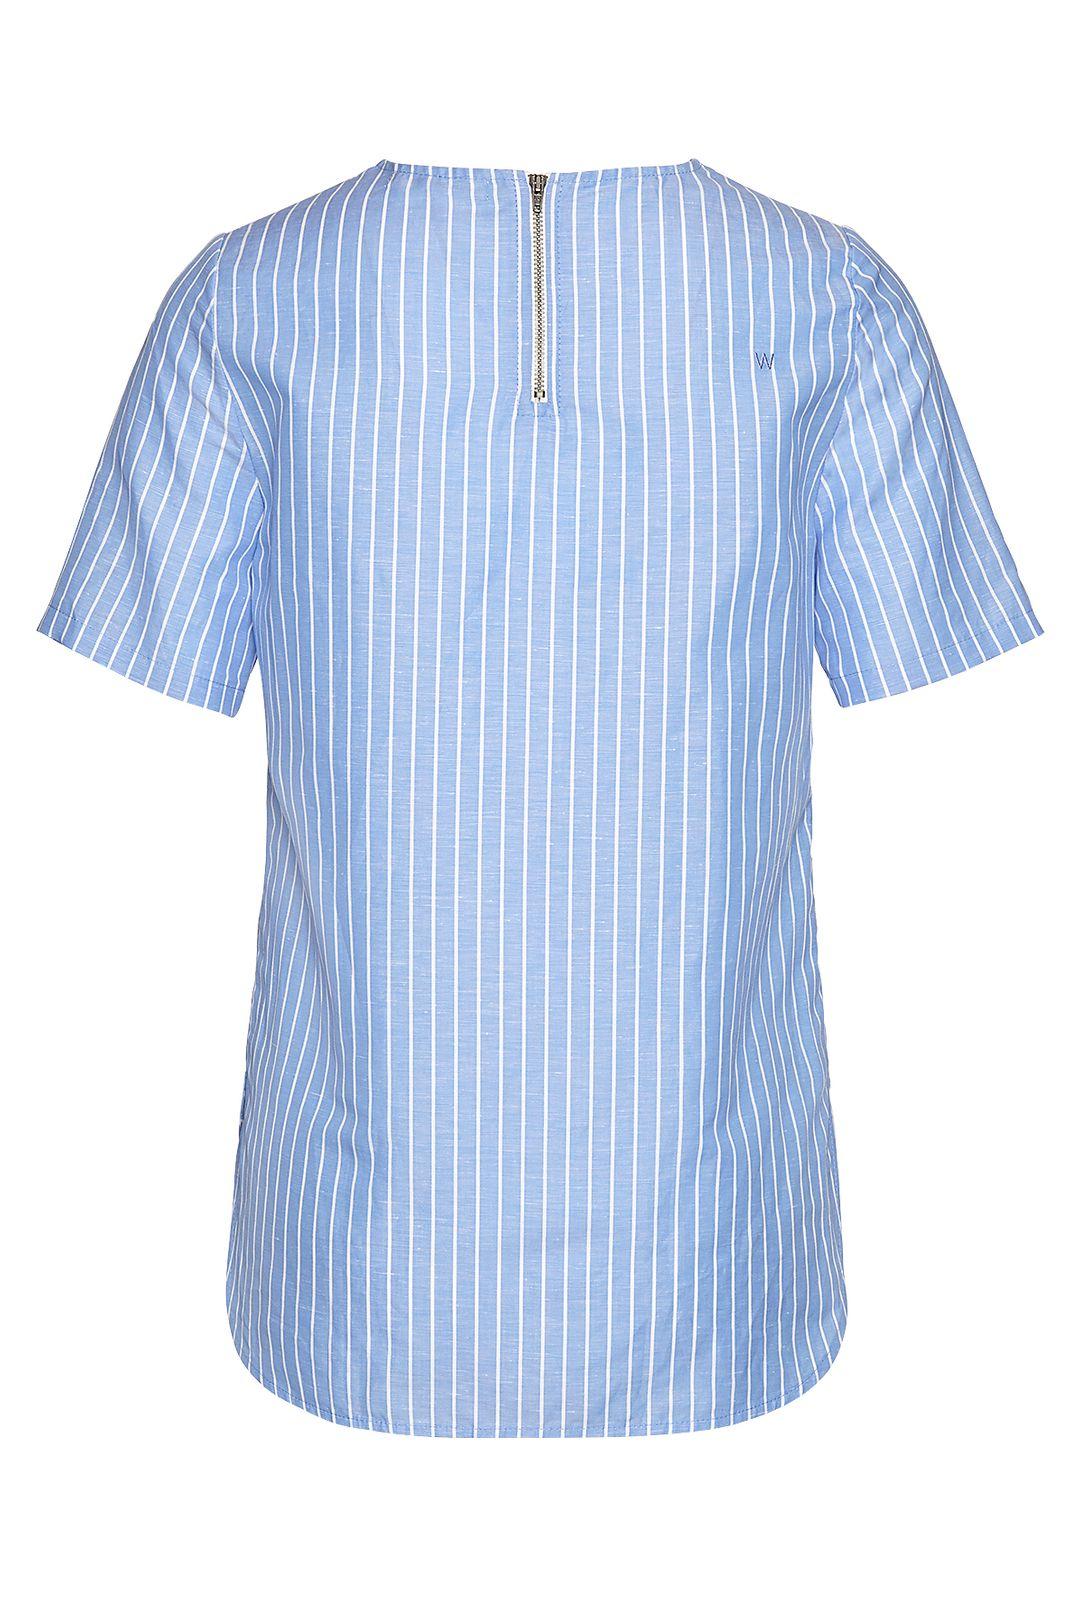 Cotton linen stripe tee blouse